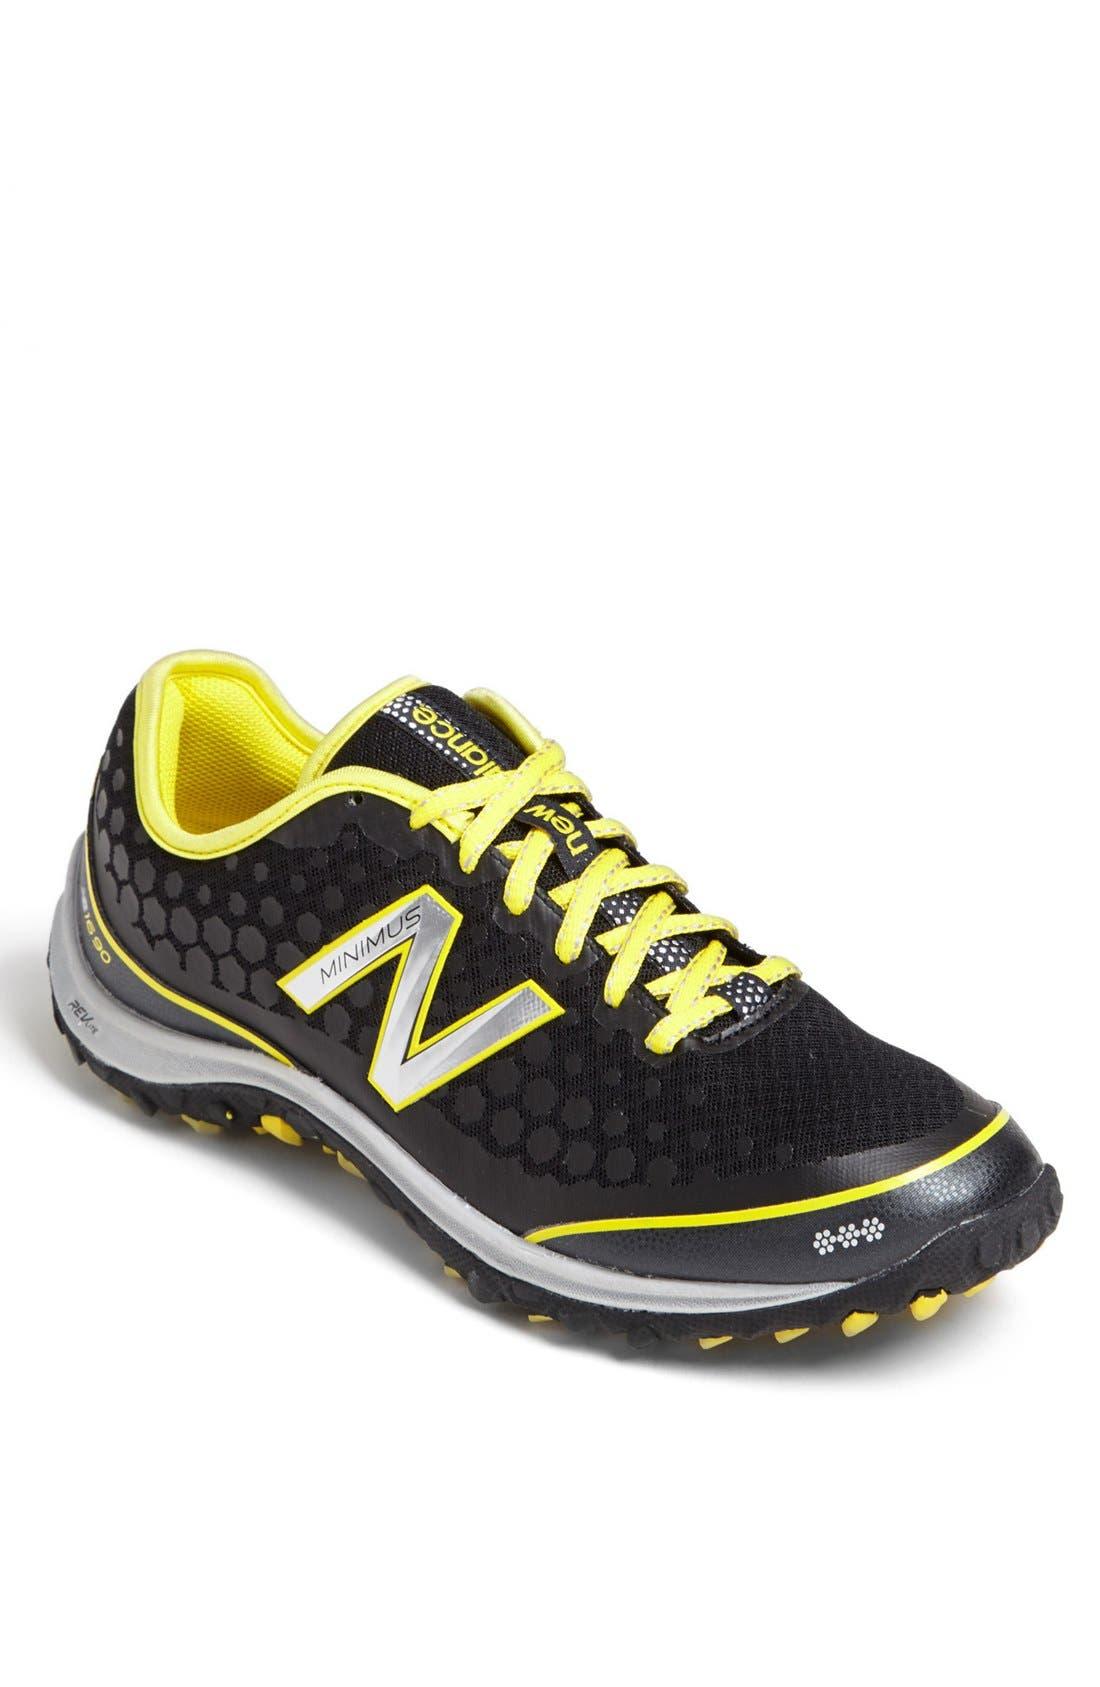 Main Image - New Balance 'Minimus 1690' Trail Running Shoe (Men)